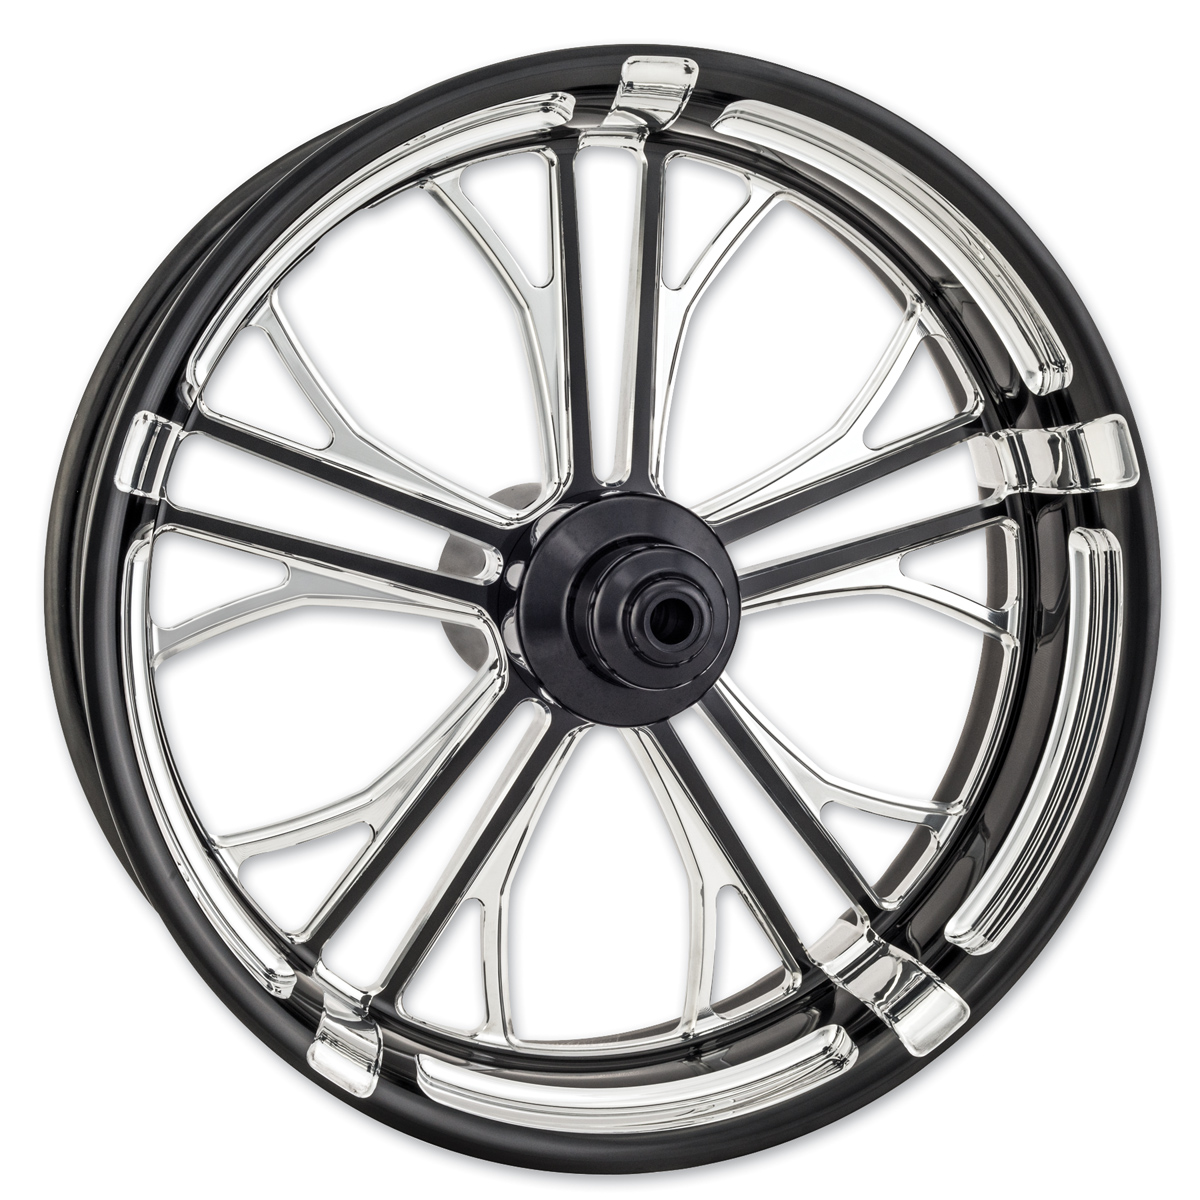 Performance Machine Dixon Platinum Cut Rear Wheel 18x5.5